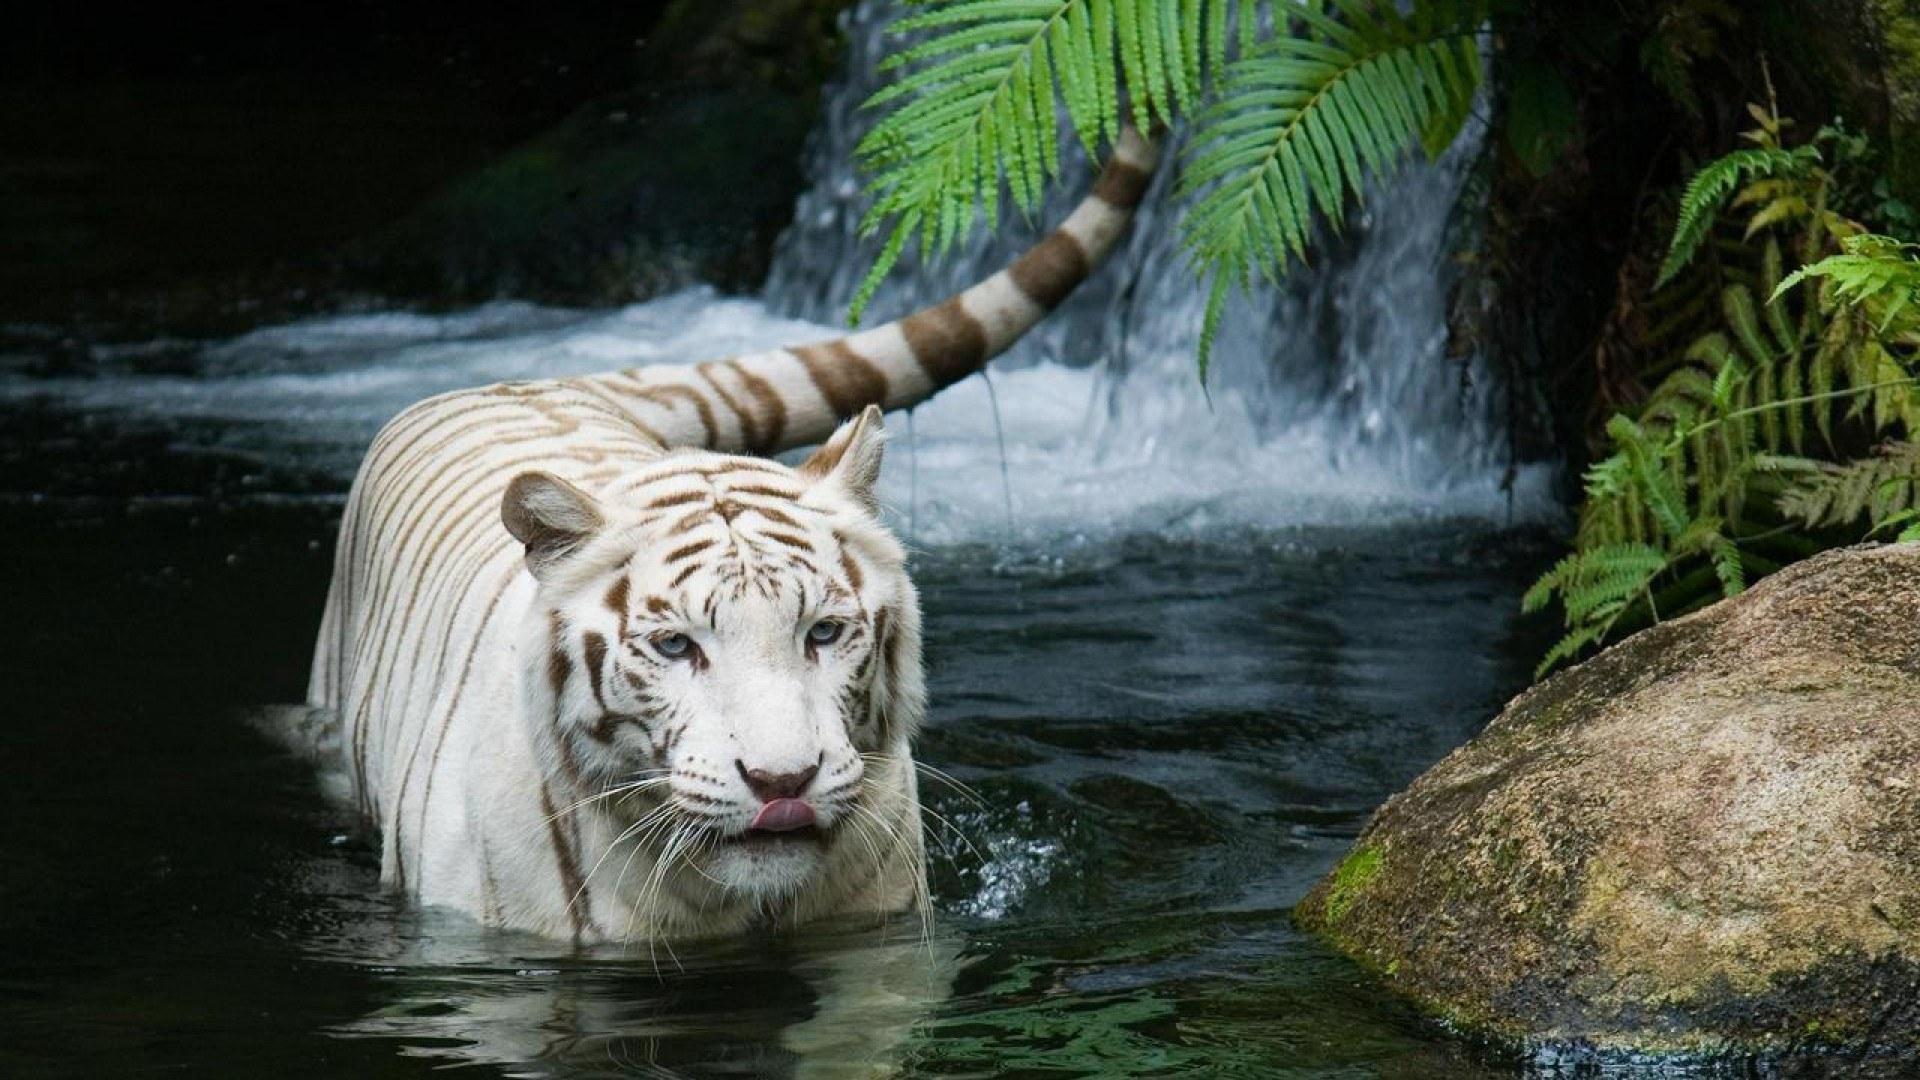 Tiger Wallpaper, HD, Wallpaper, 1080p, Widescreen, High .